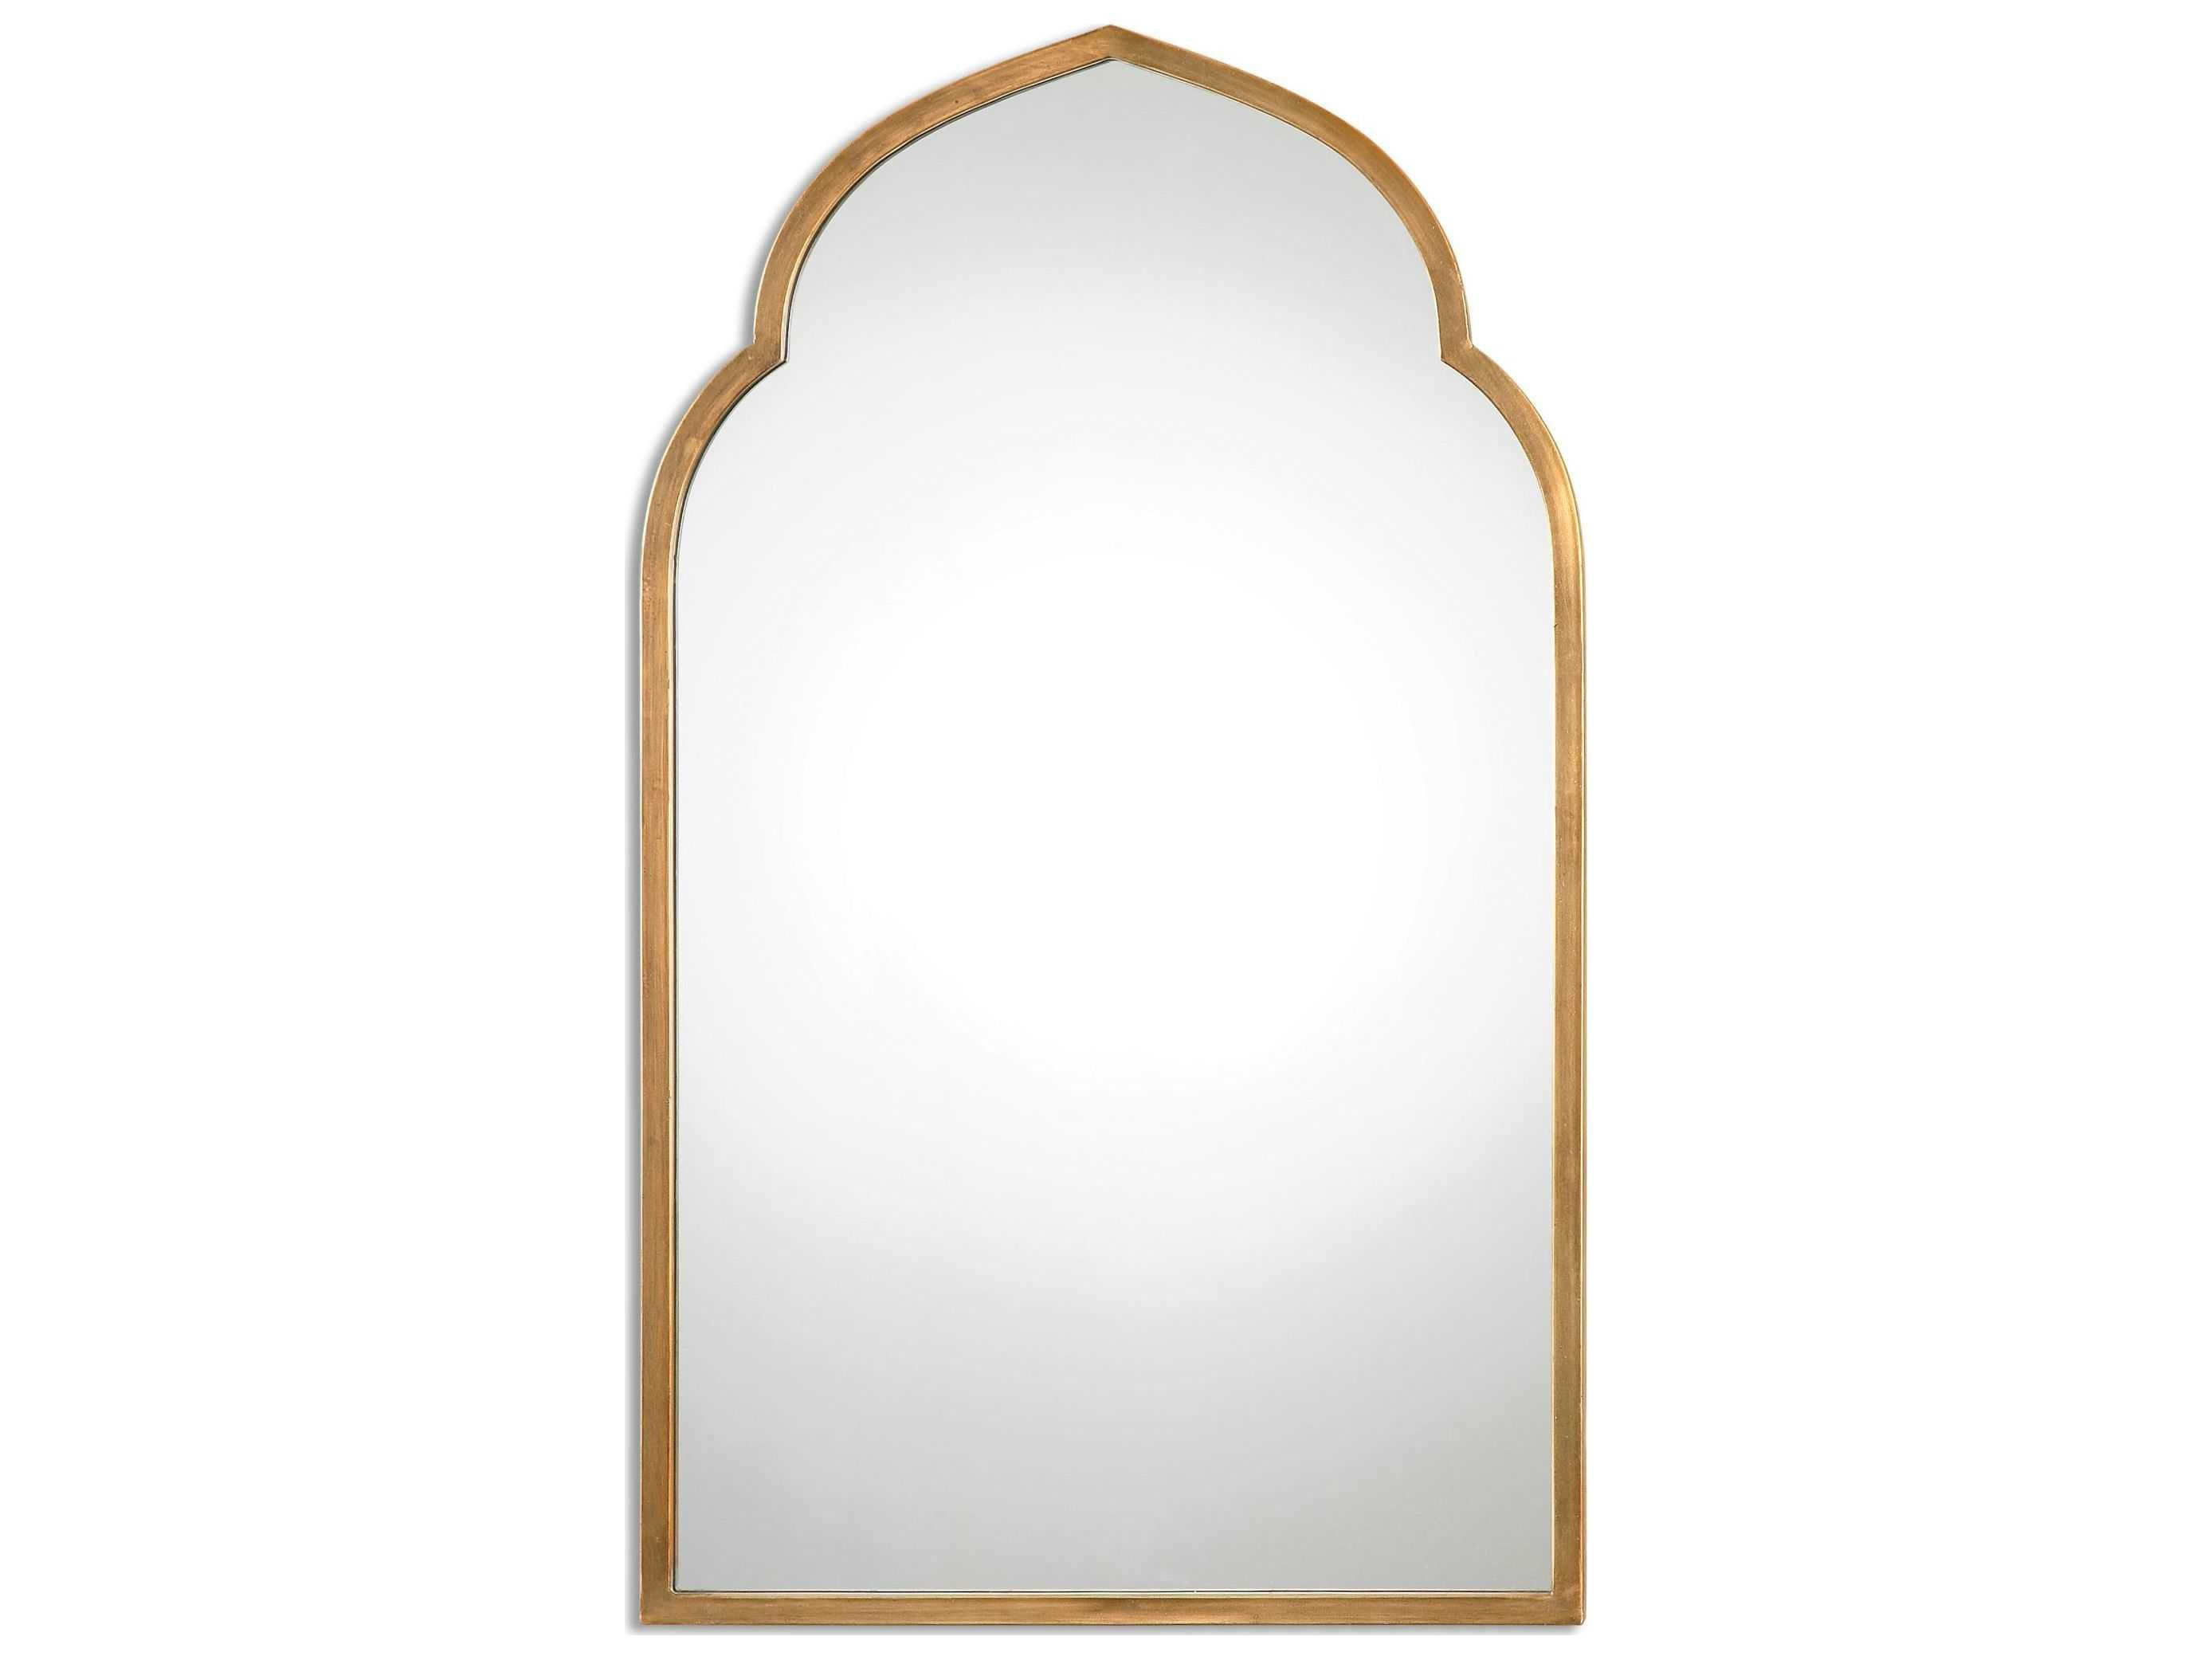 Uttermost Kenitra 24 X 40 Gold Arch Wall Mirror Gold Mirror Wall Antique Mirror Wall Gold Arch Mirror